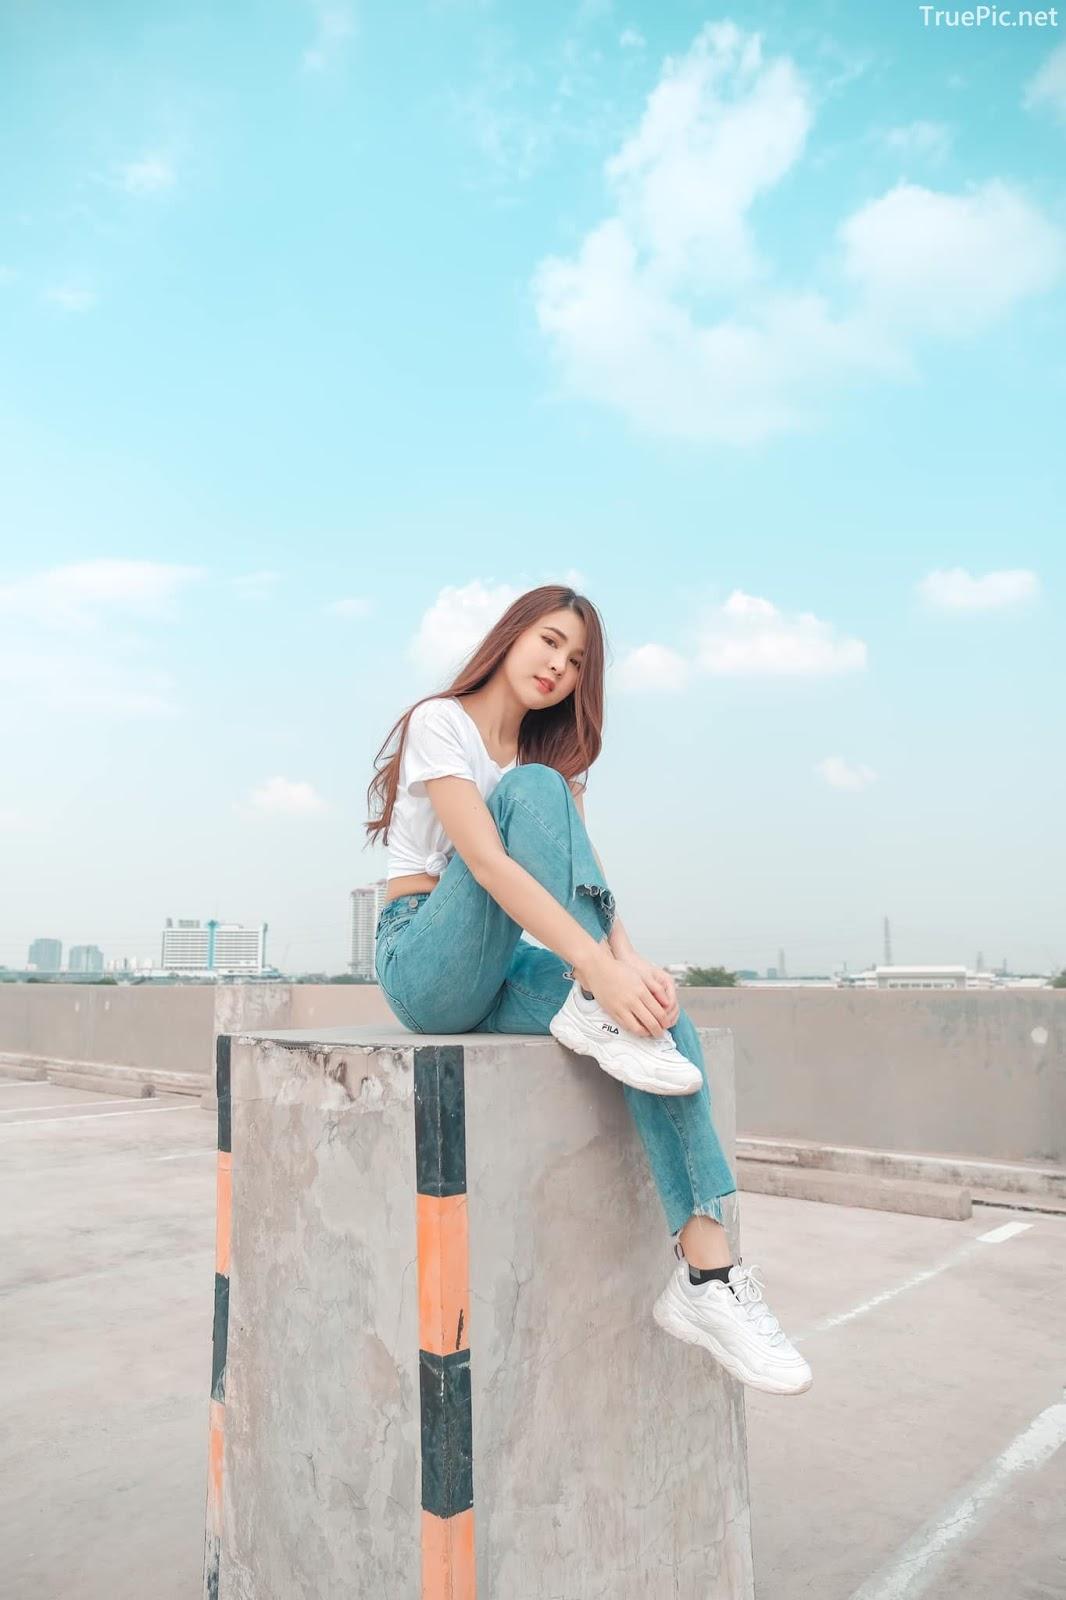 Thailan cute model - Supansa Yoopradit (Lorpor) - The terrace is full of windy afternoon - Picture 4